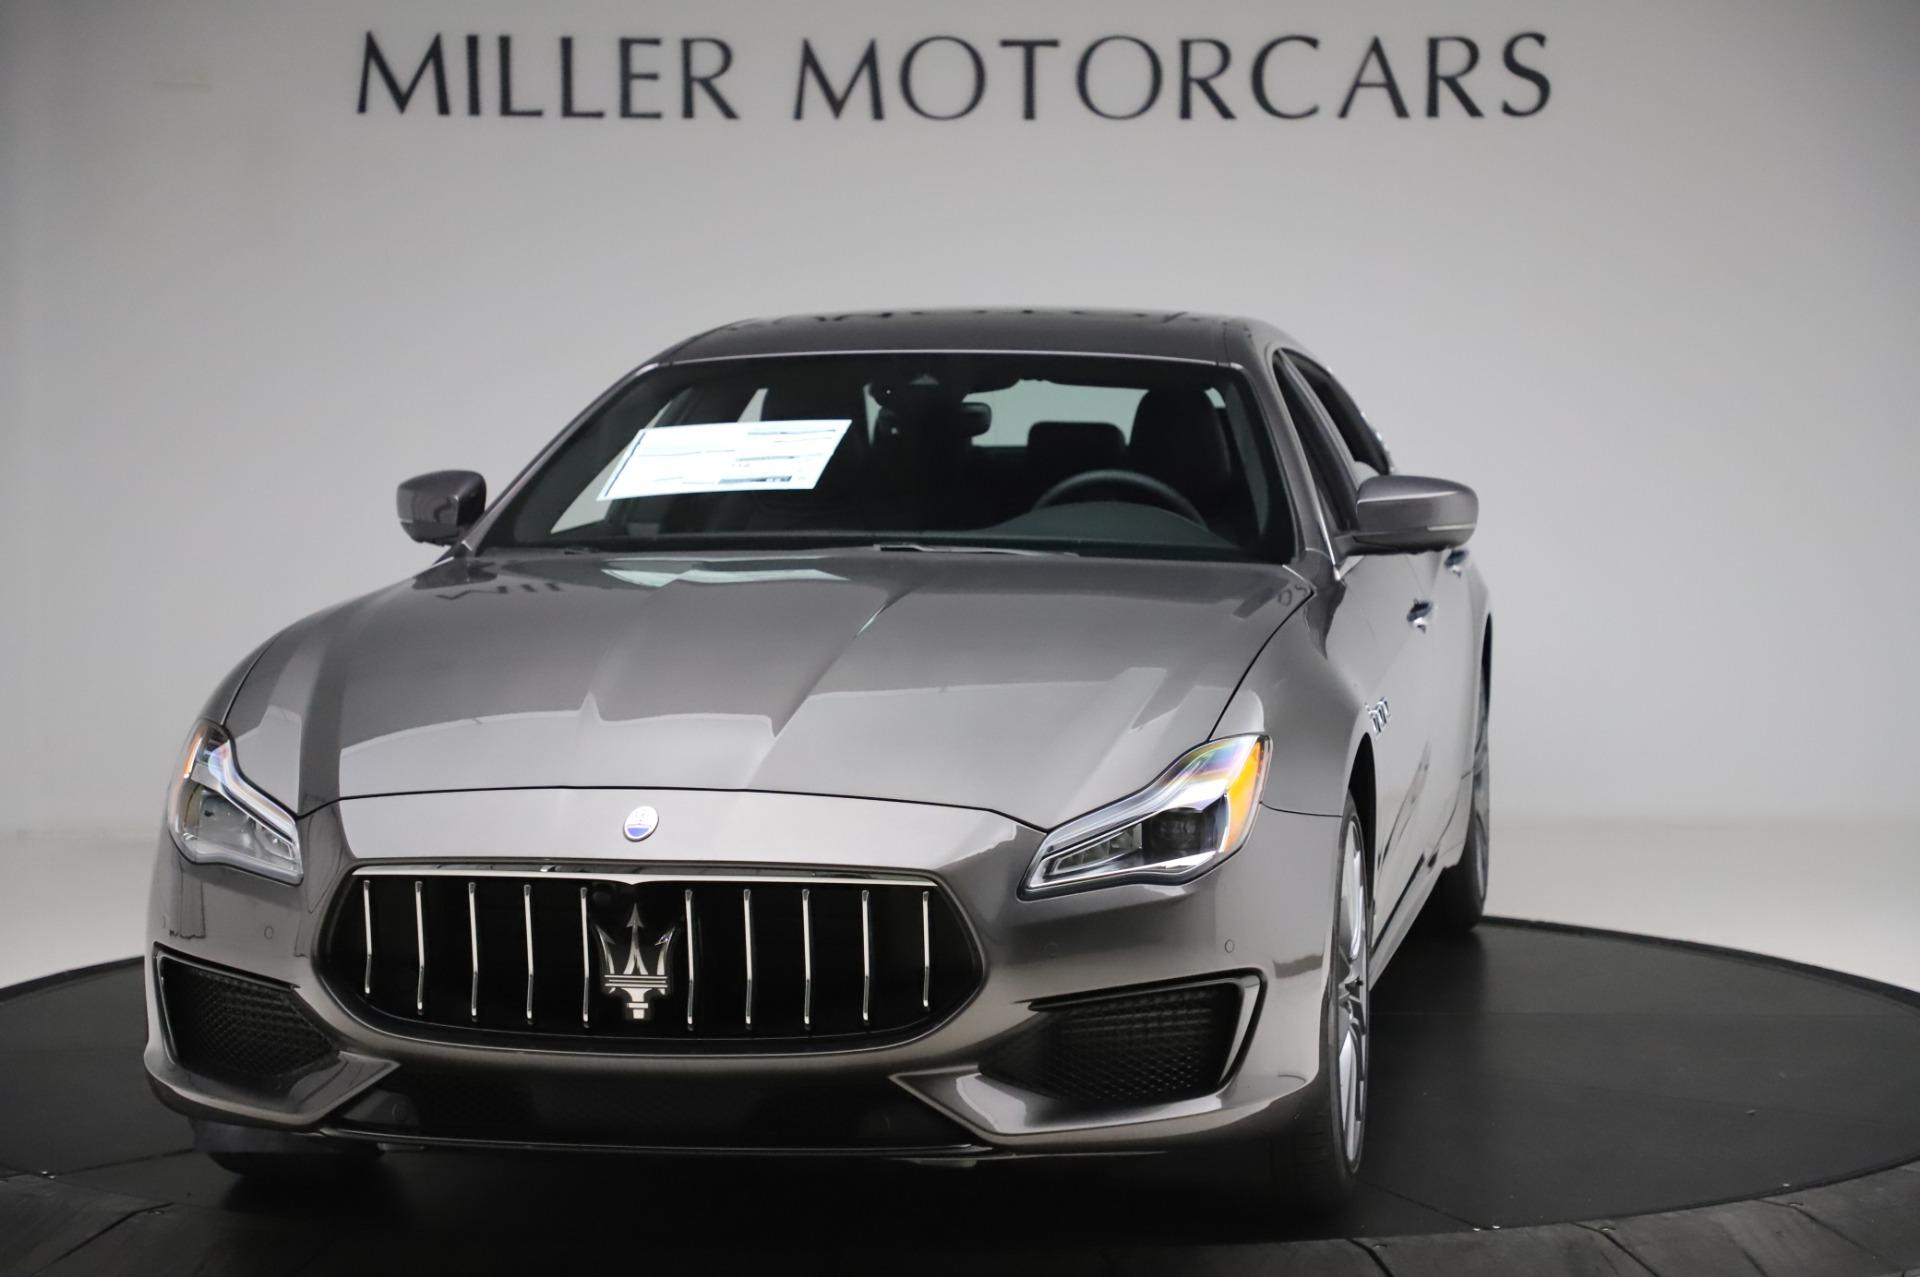 New 2020 Maserati Quattroporte S Q4 GranSport for sale $125,085 at Pagani of Greenwich in Greenwich CT 06830 1